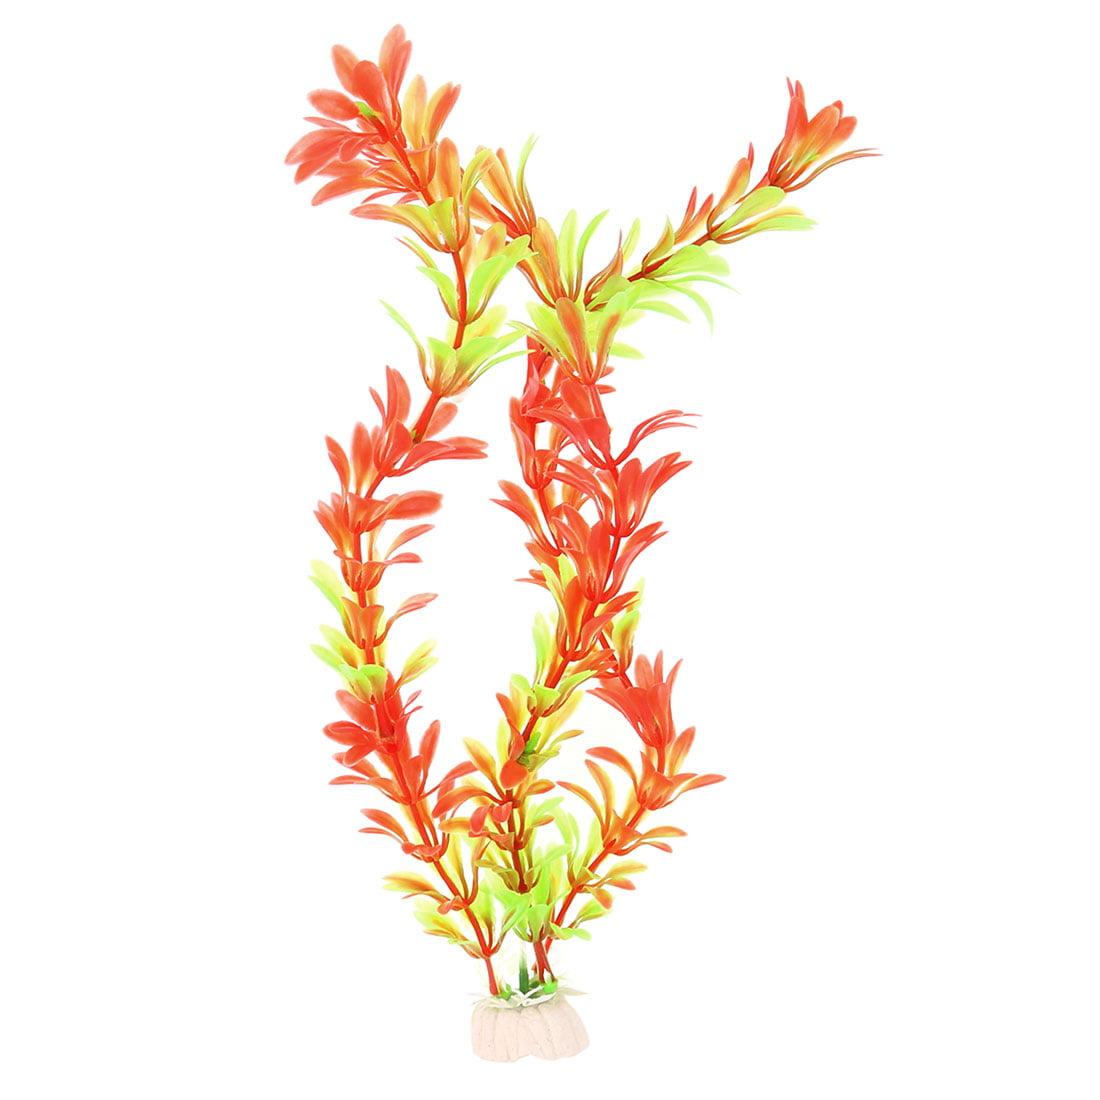 Aquarium Plastic Artificial Plant Grass Decoration Light Green Red 30cm Height